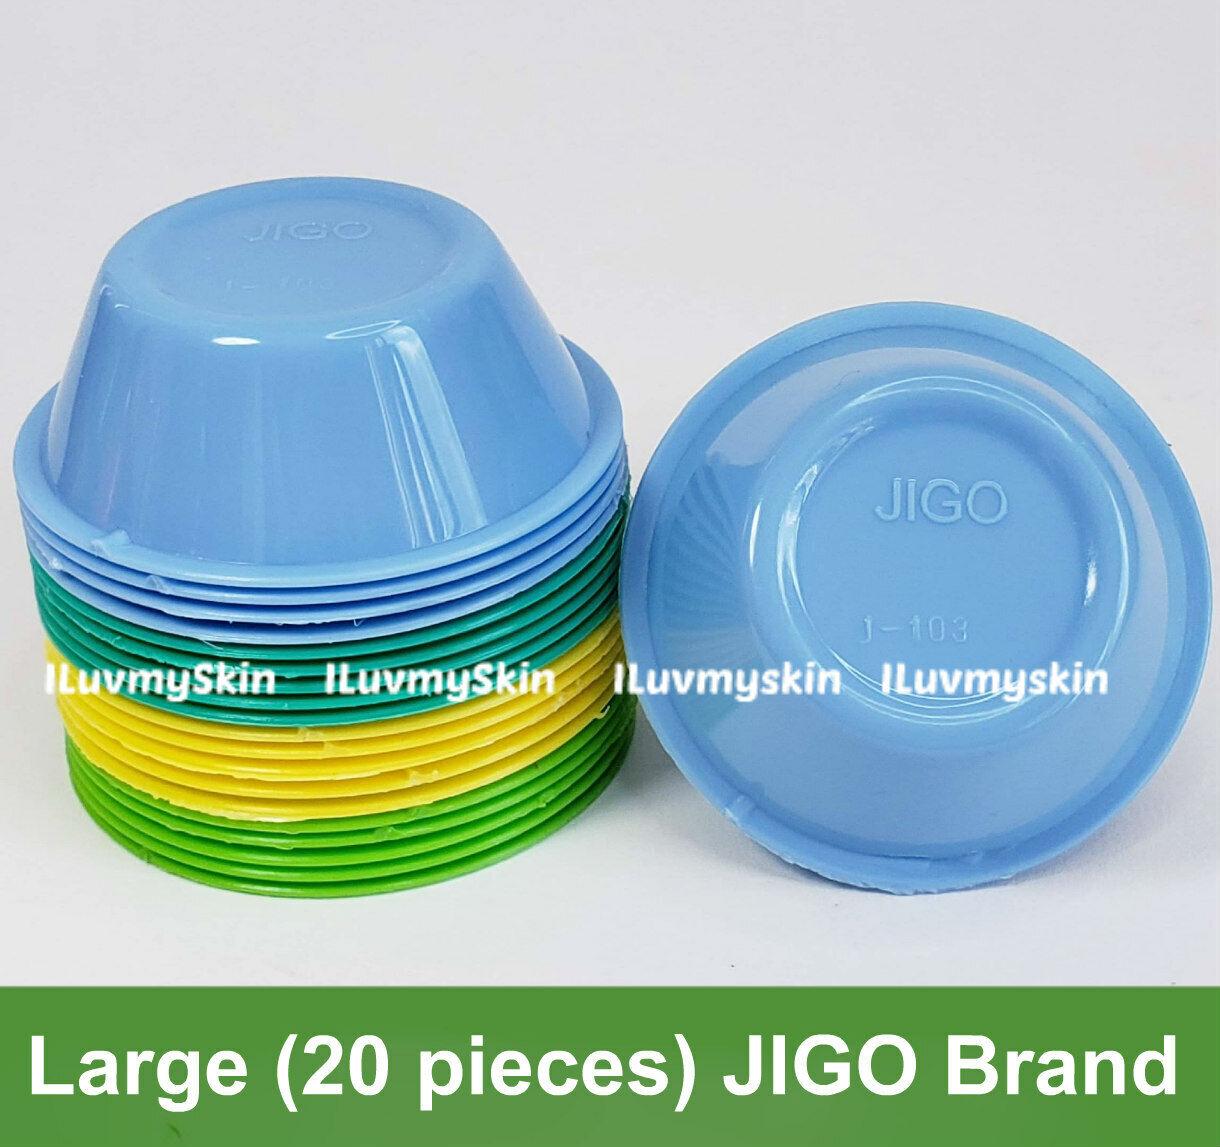 Large (20 pieces) JIGO Brand